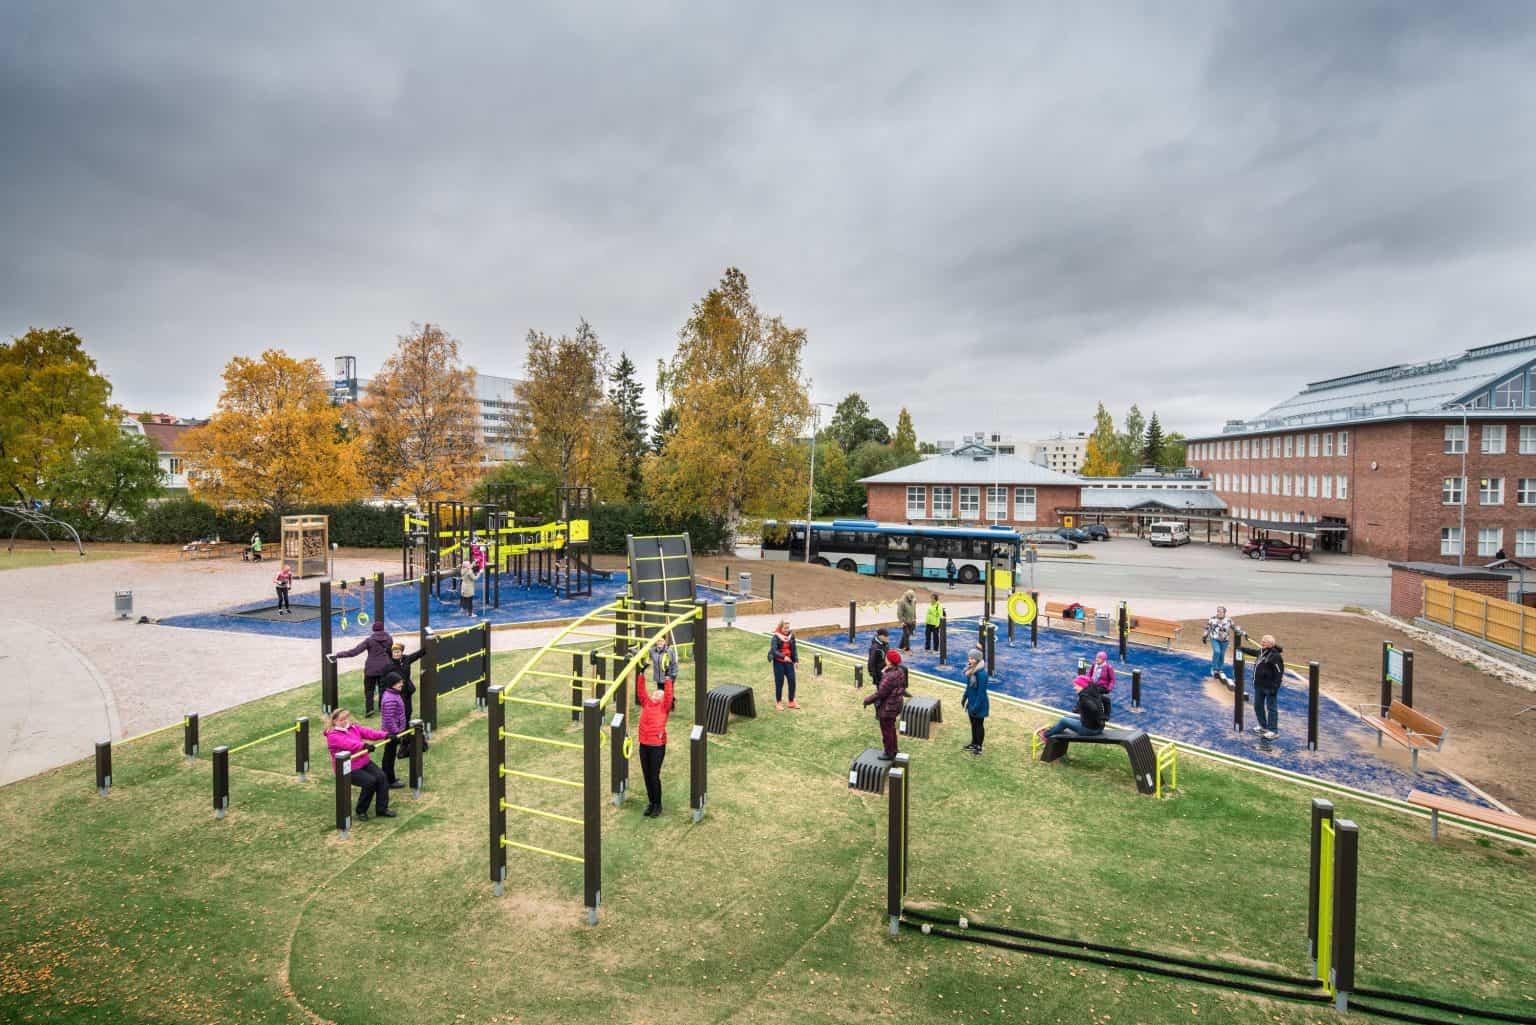 outdoor-fitness-equipment_49643287143_o-1536x1025